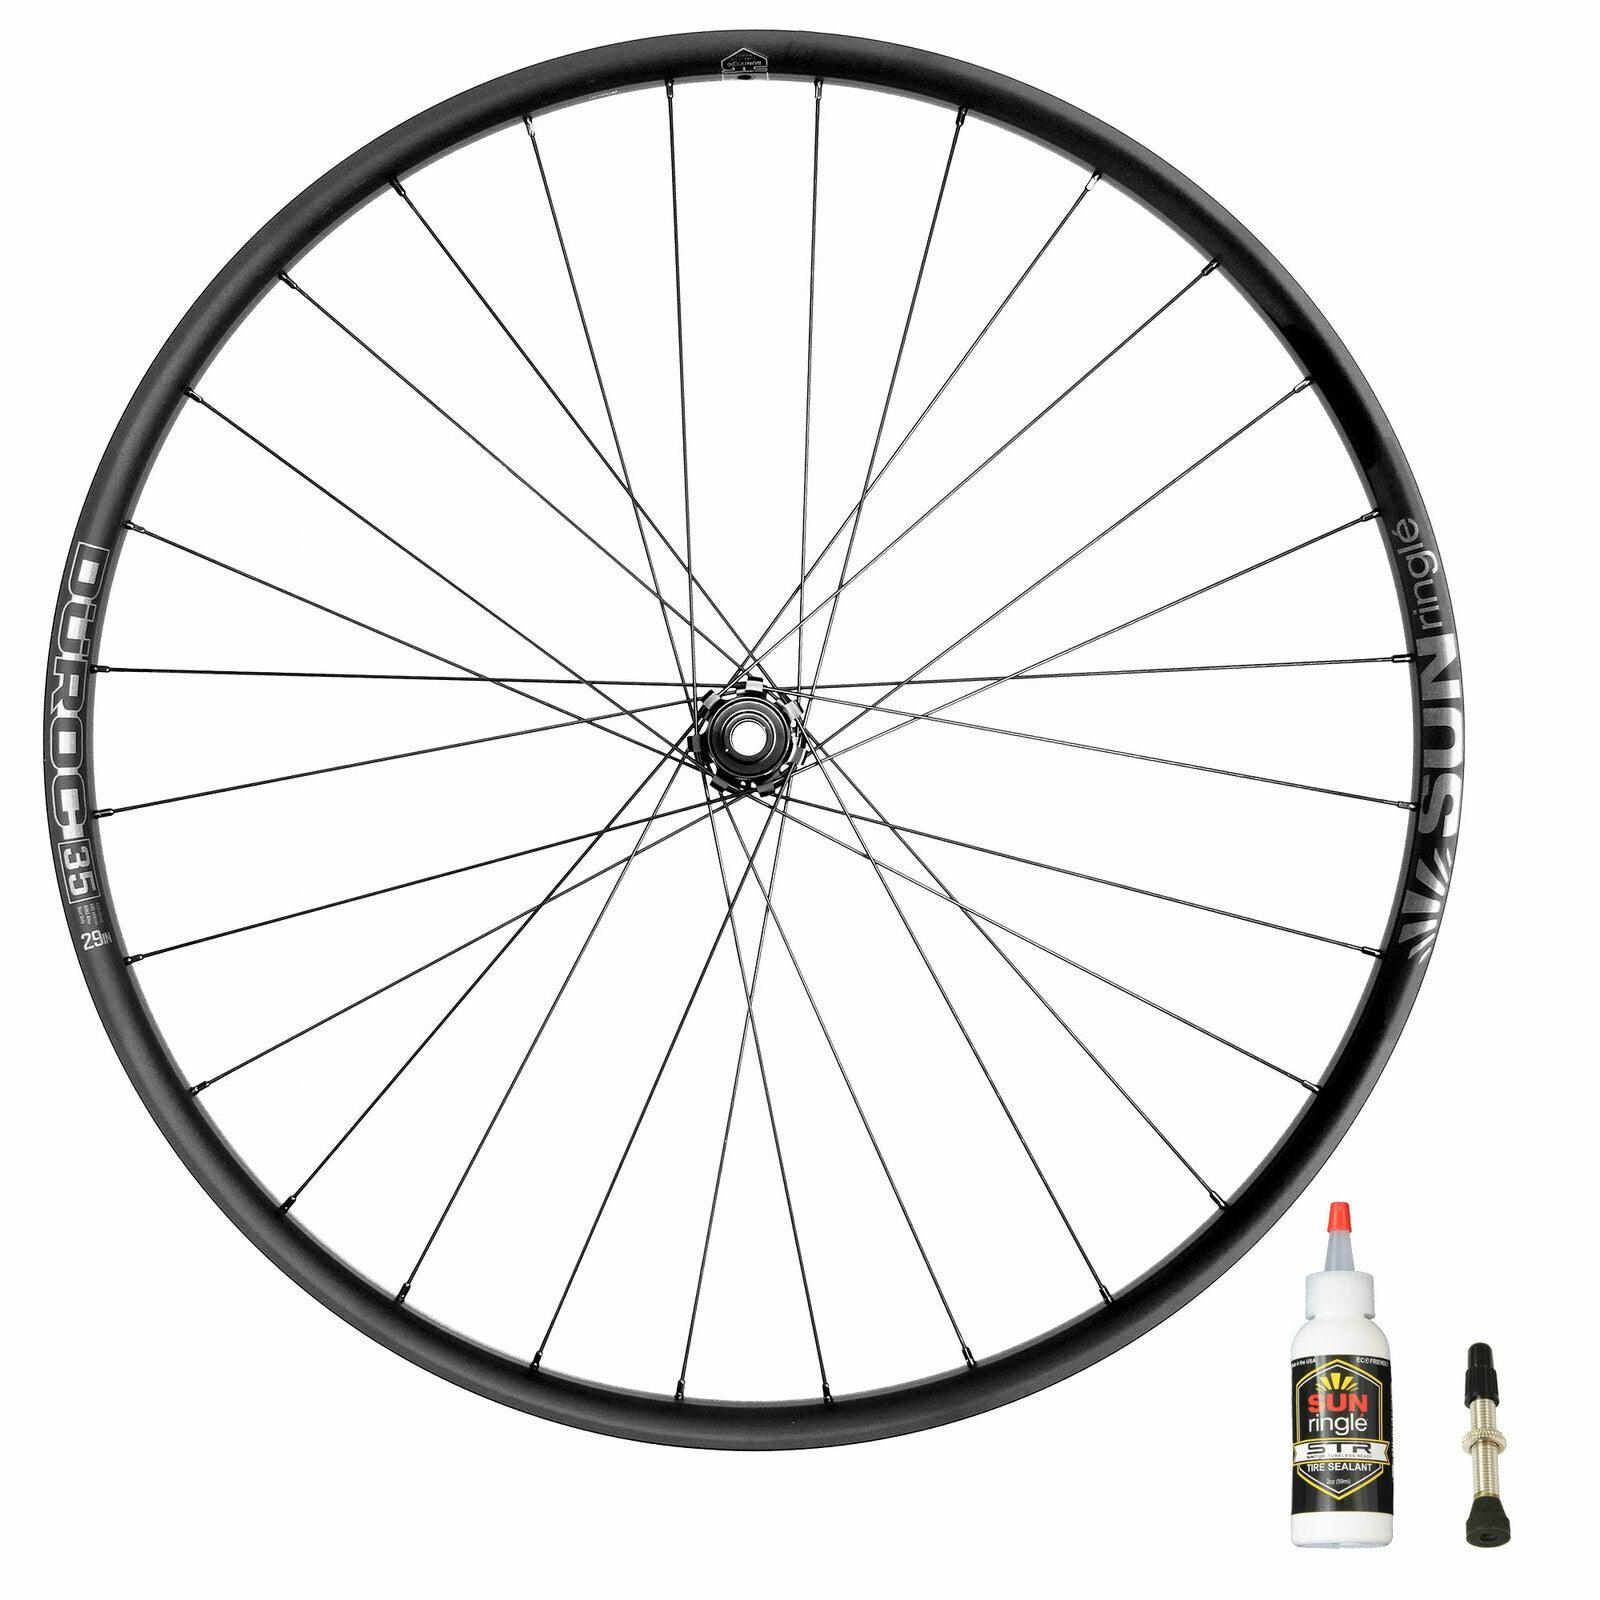 "Sun Ringle Duroc 35 Expert Bike Bicycle Tubeless Ready Wheelset 27.5"""